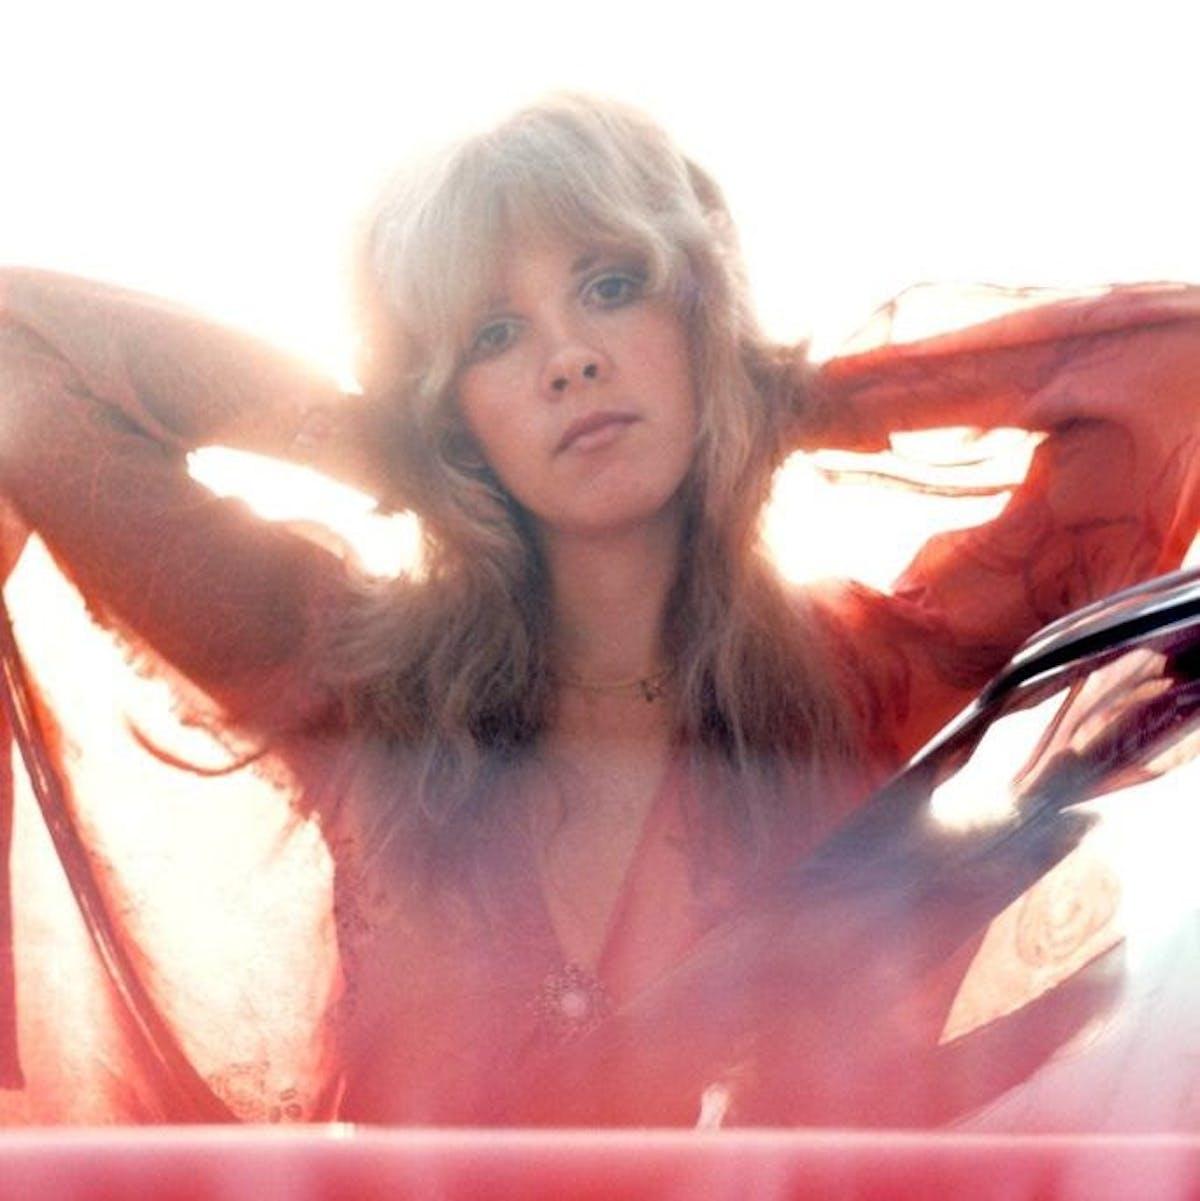 Stevie Nicks from Fleetwood Mac